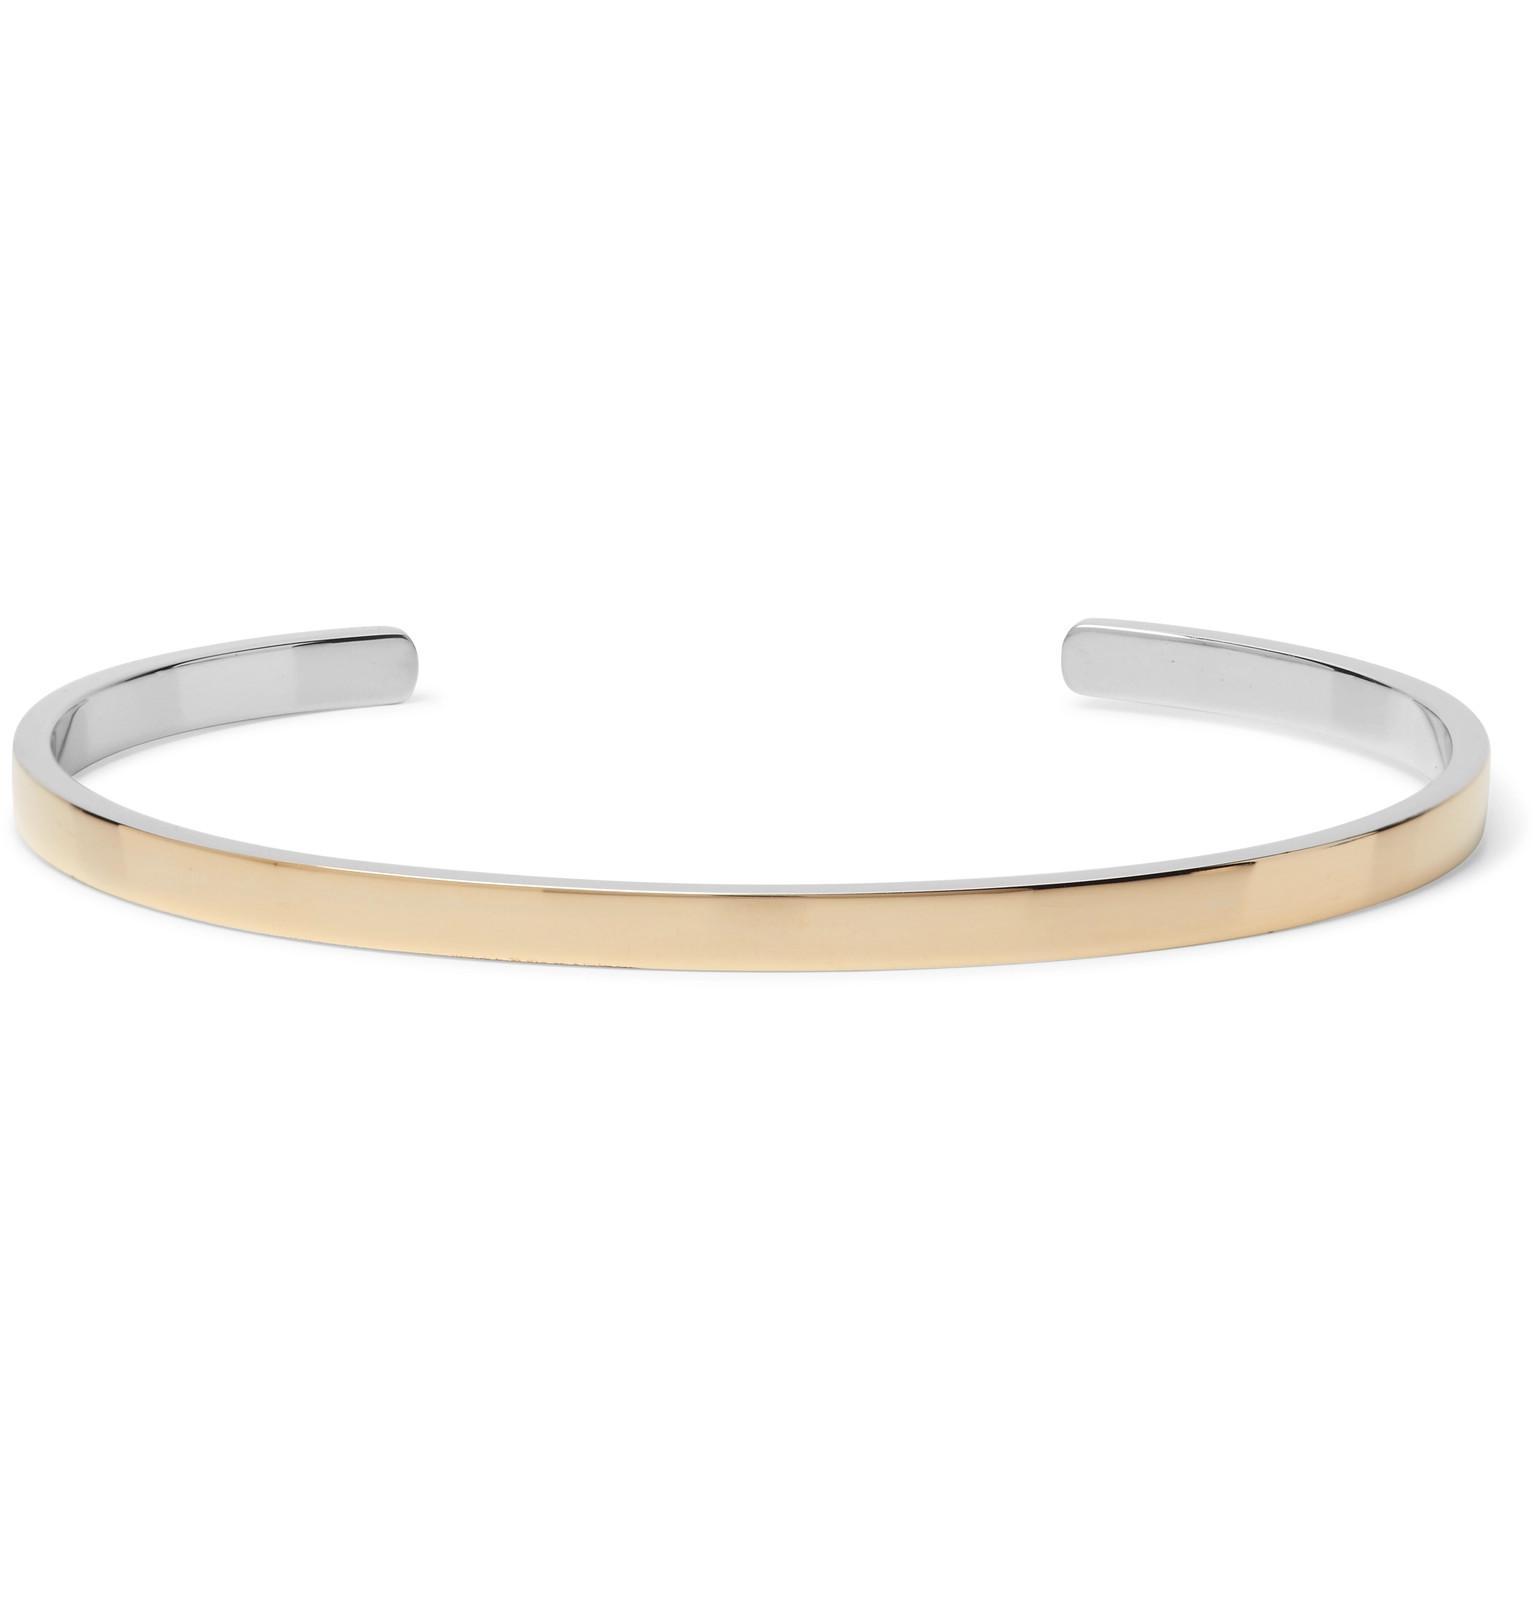 Fusion 14-karat Gold And Sterling Silver Ring Miansai TImIK